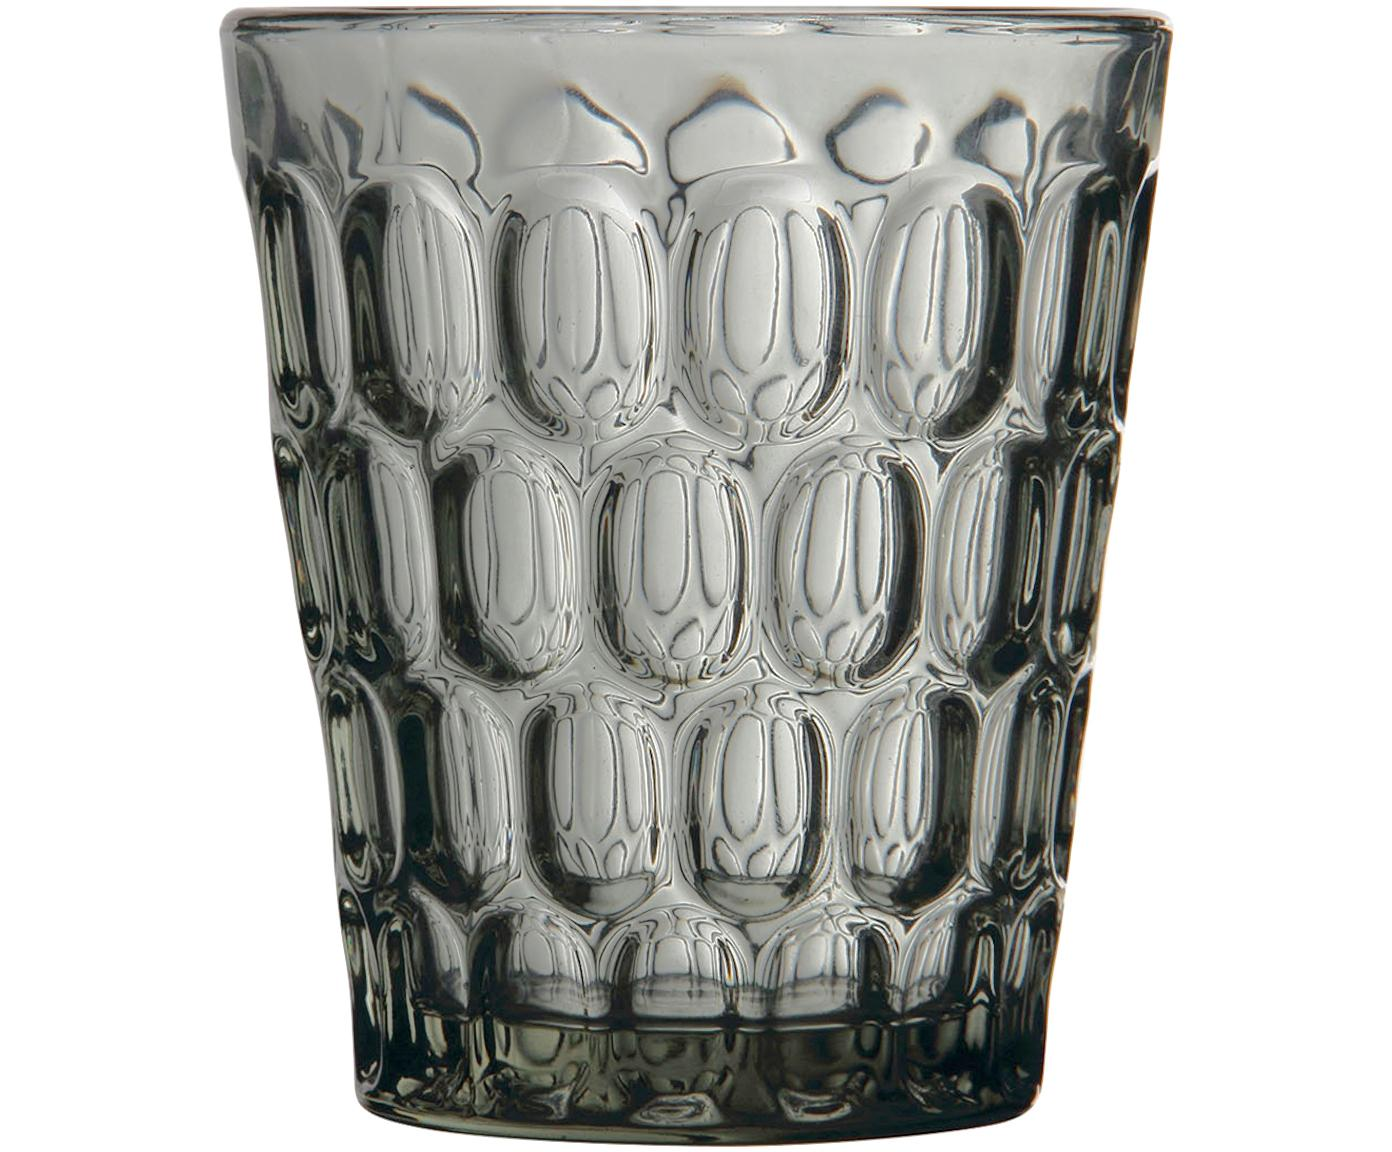 Robuste waterglazen Optic met reliëf, 6-delig, Glas, Transparant, grijs, Ø 9 x H 11 cm